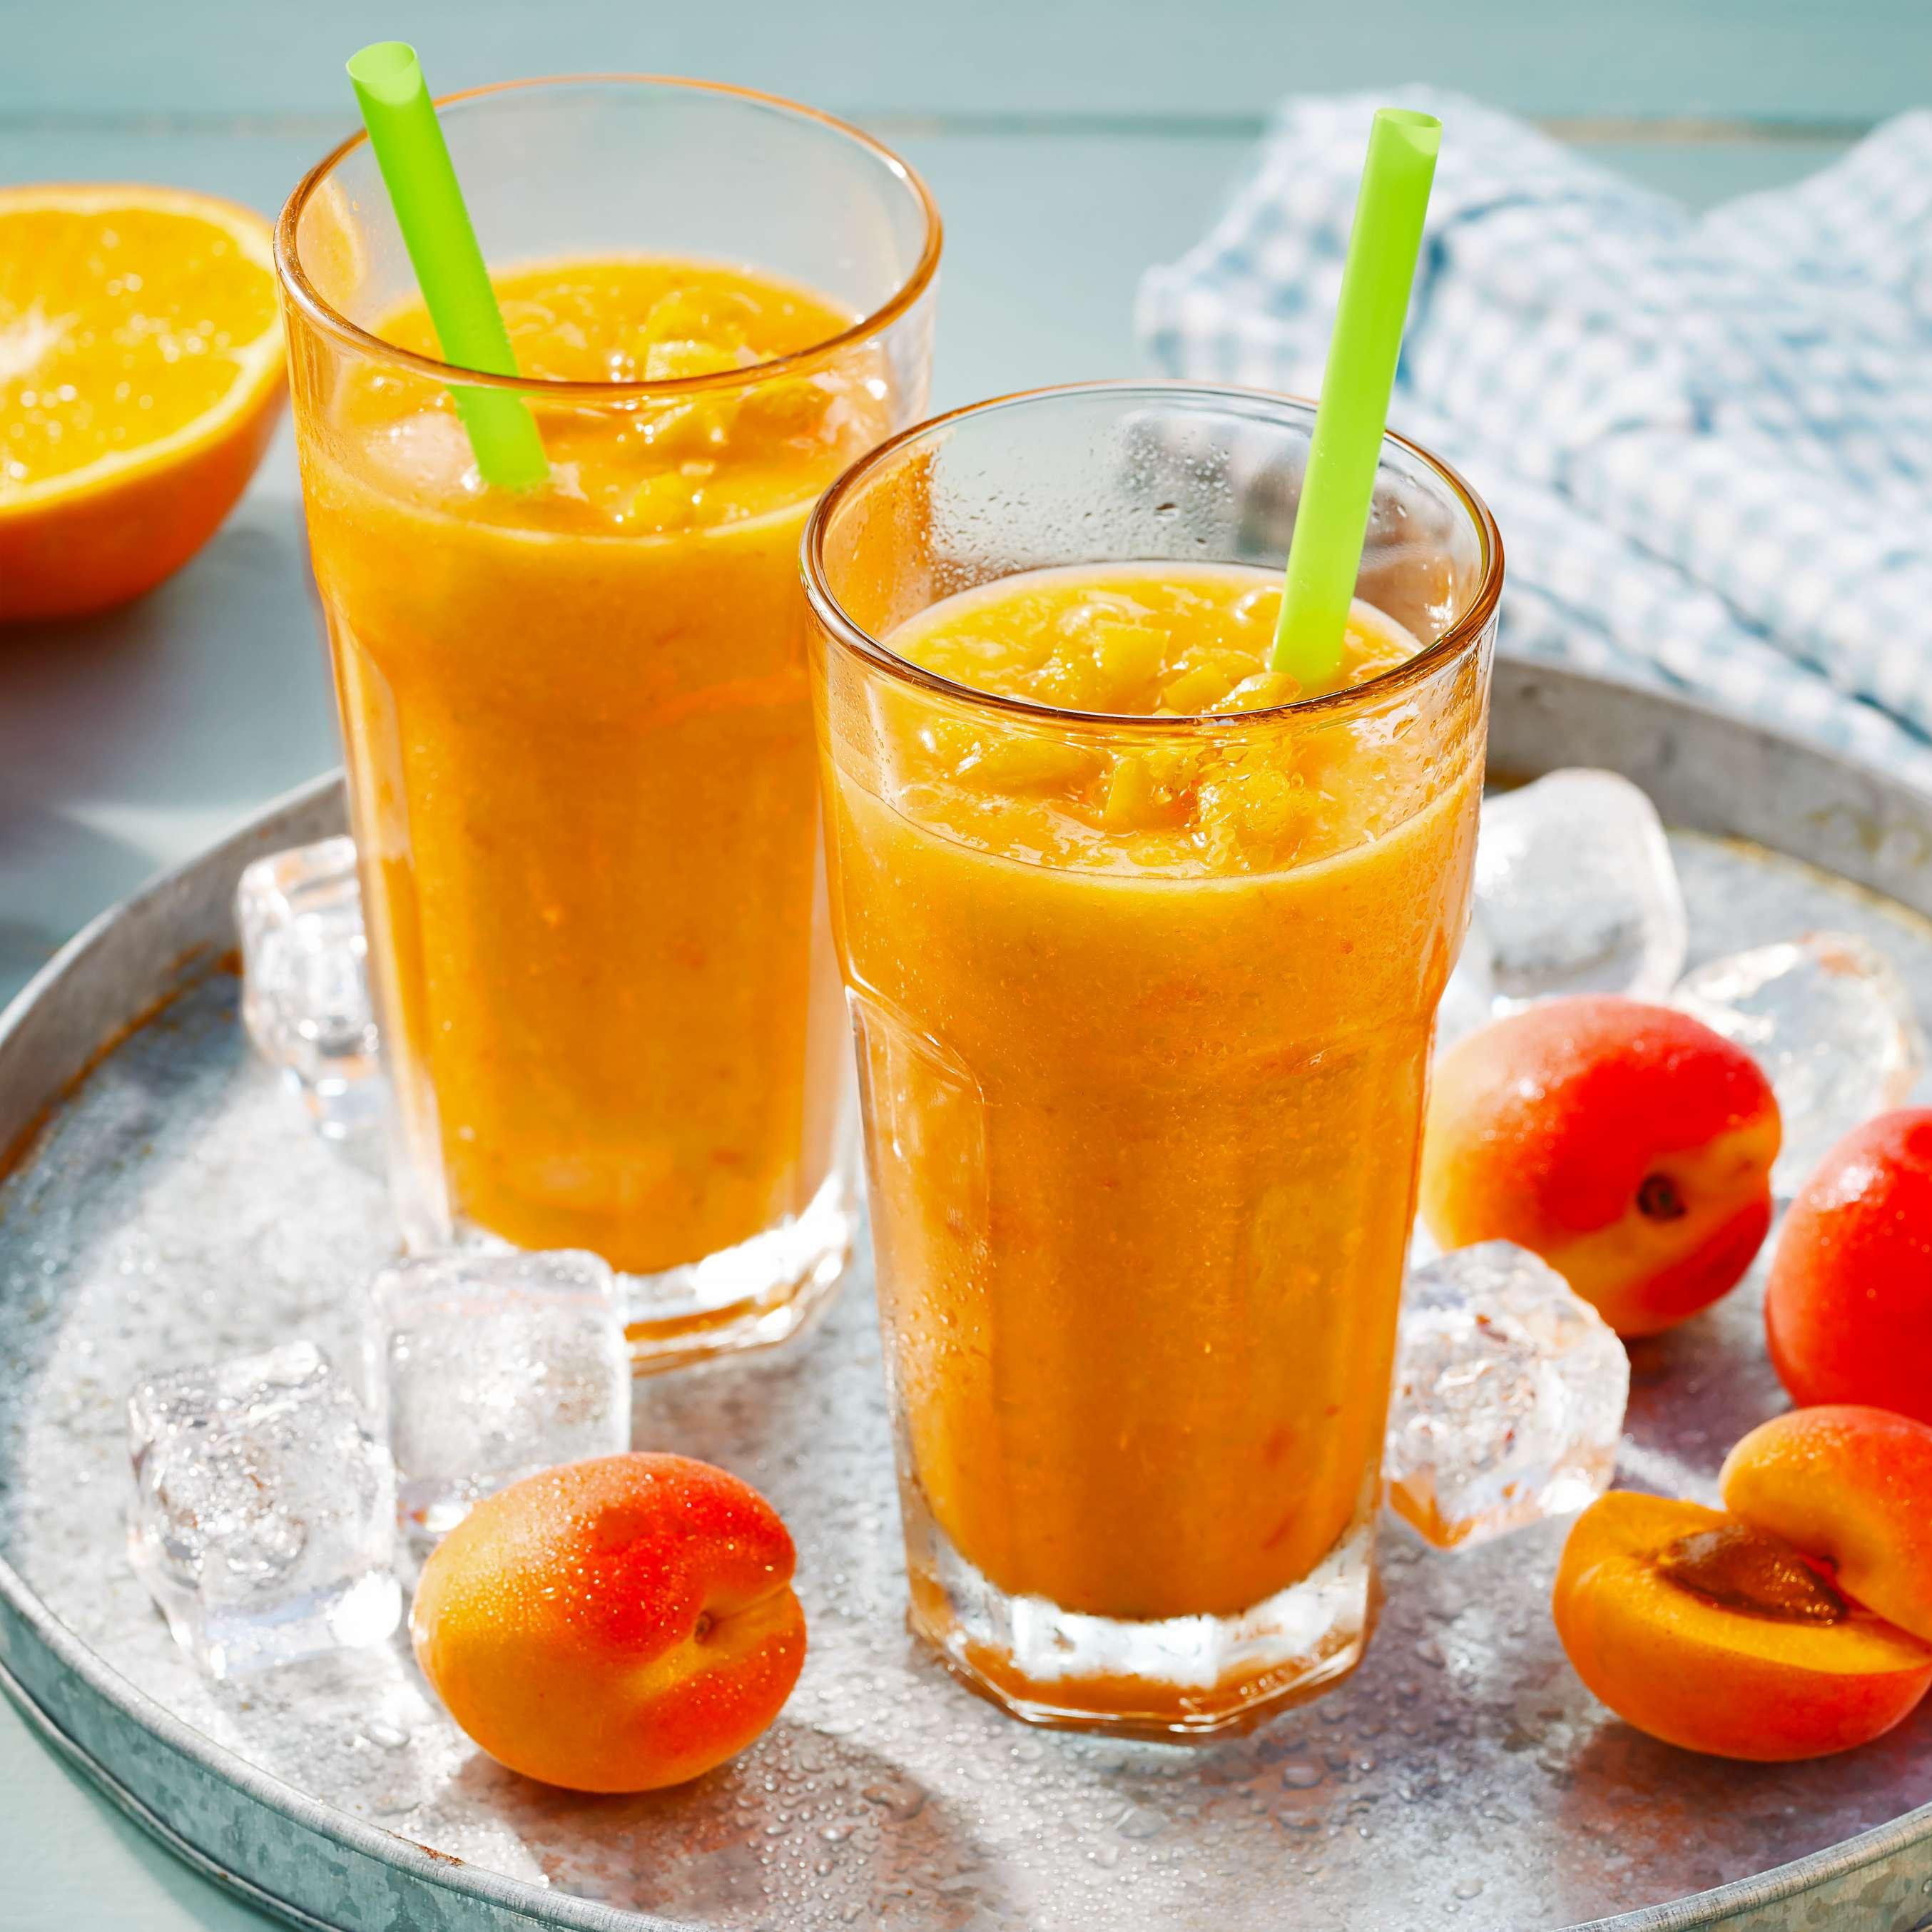 Aprikosen Smoothie Mit Grapefruit Und Orange Rezept